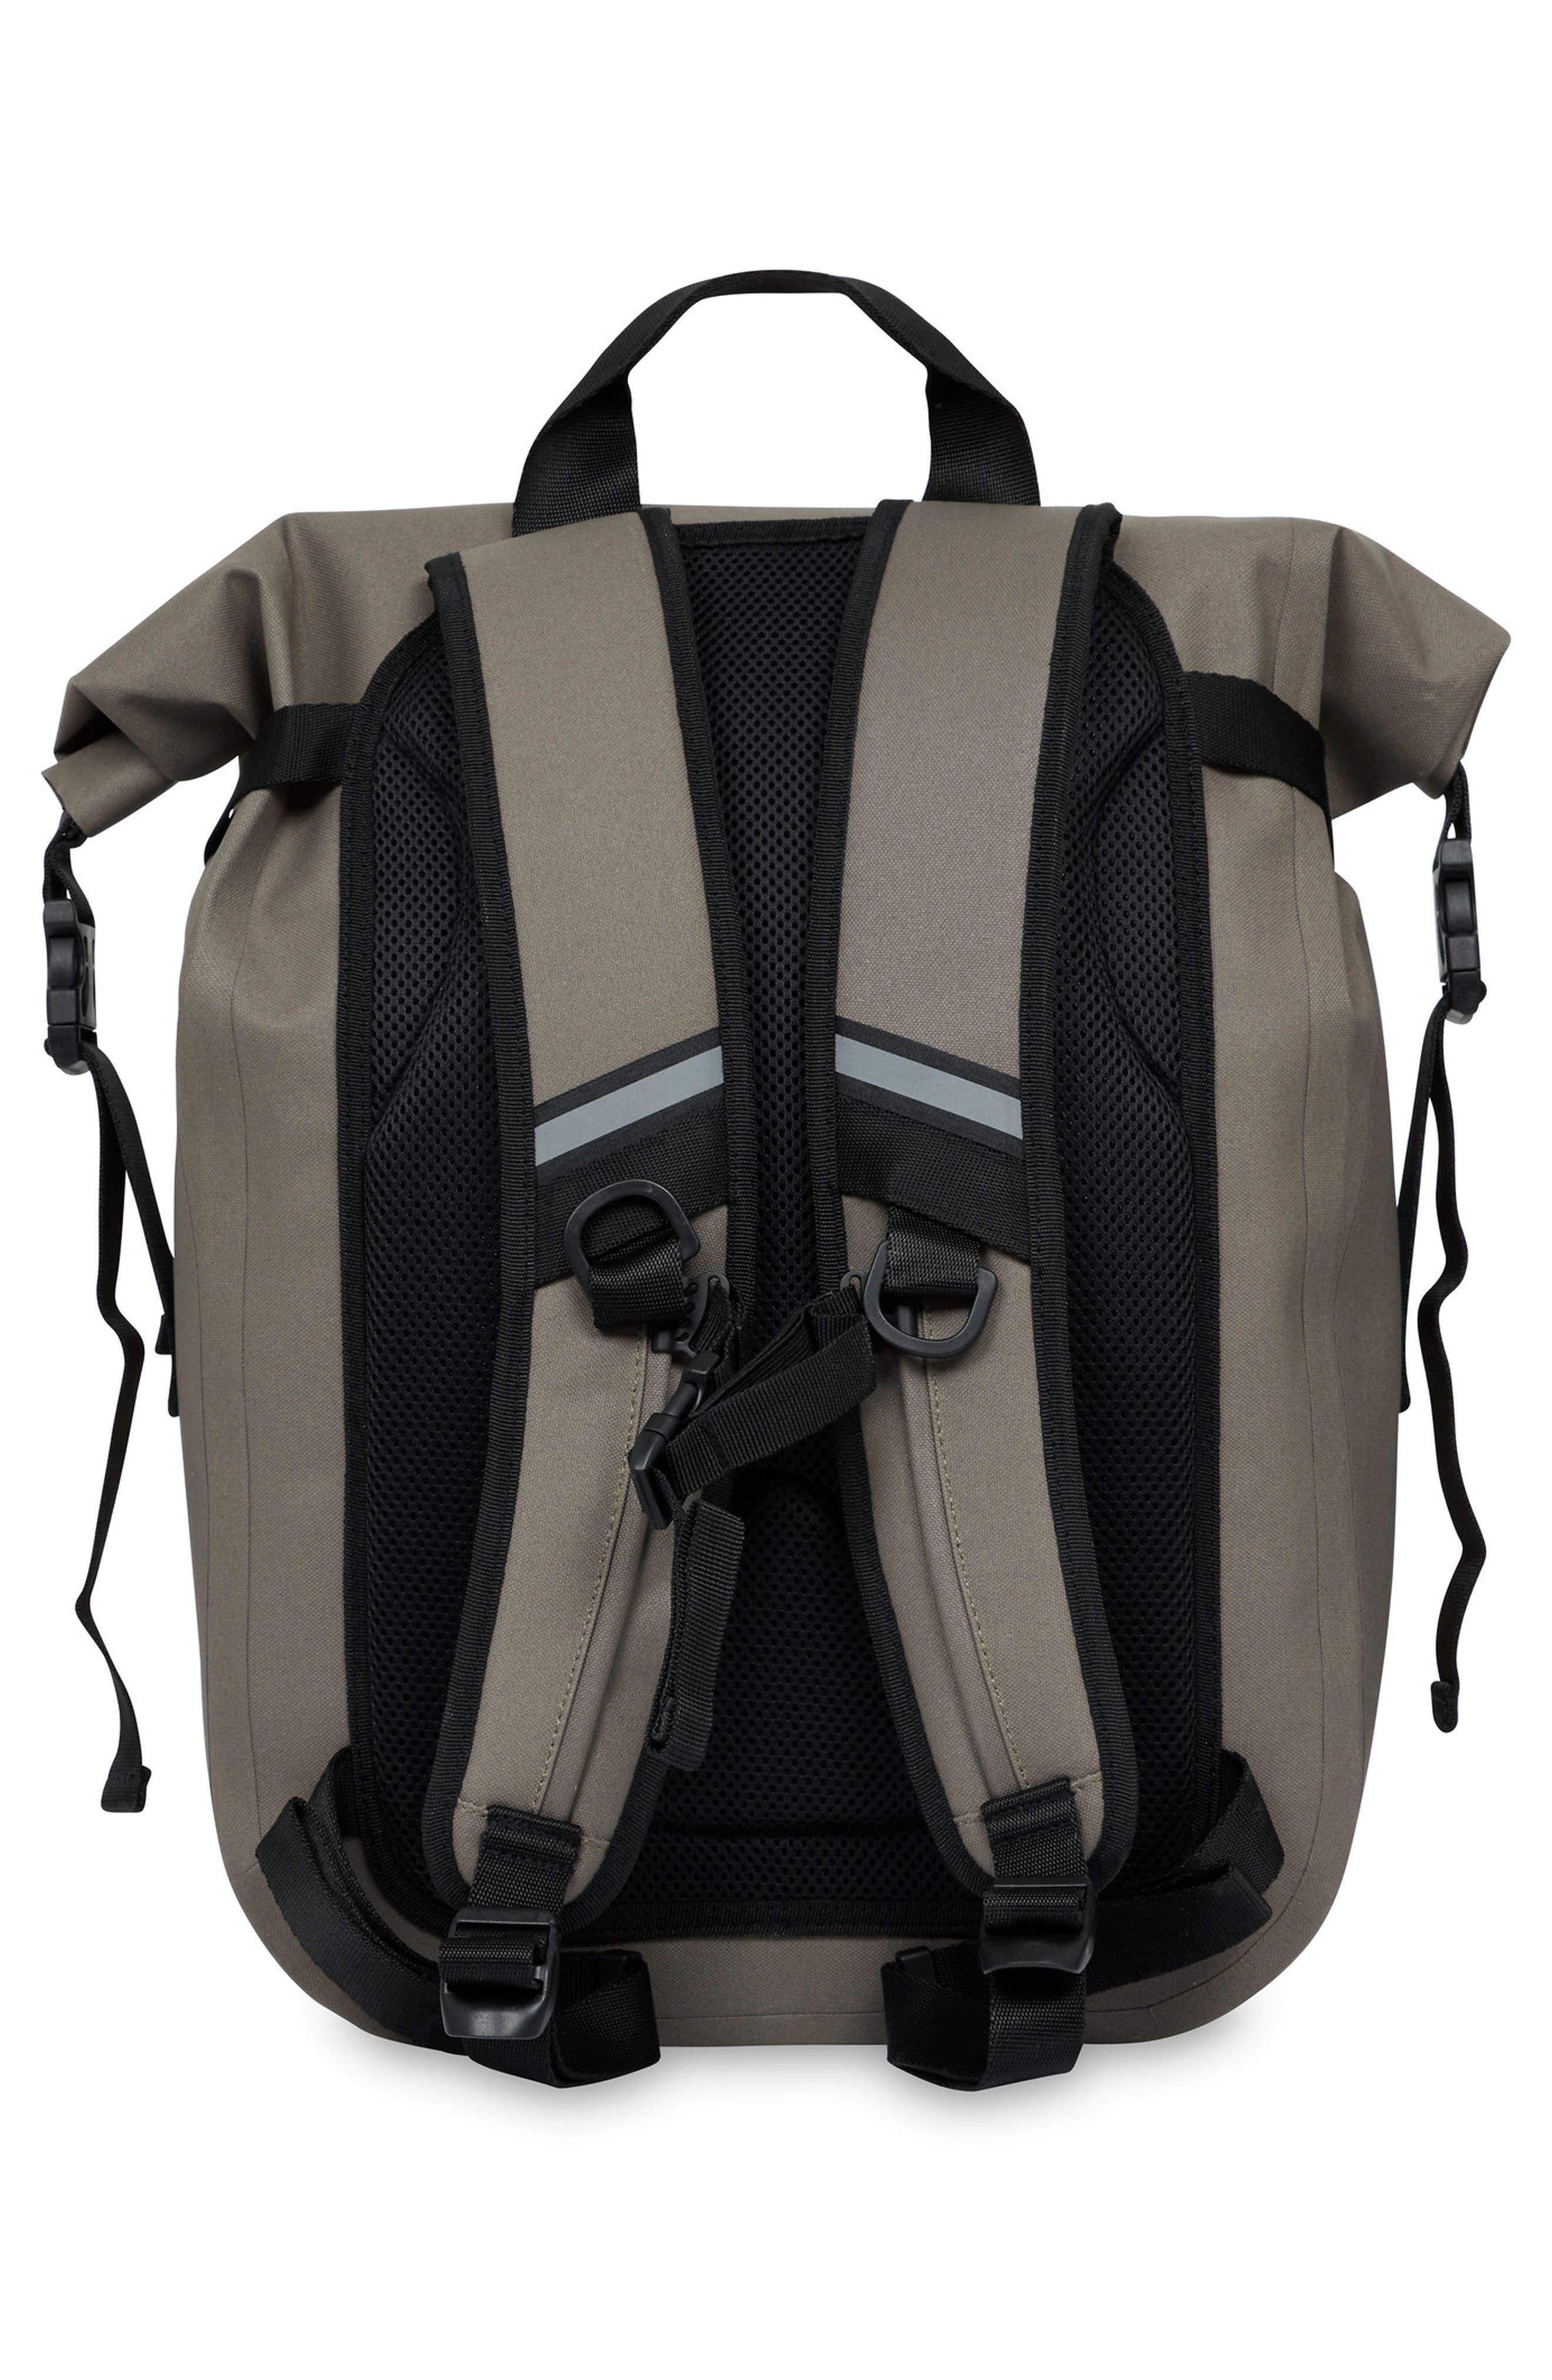 Thames Backpack,                             Alternate thumbnail 2, color,                             KHAKI